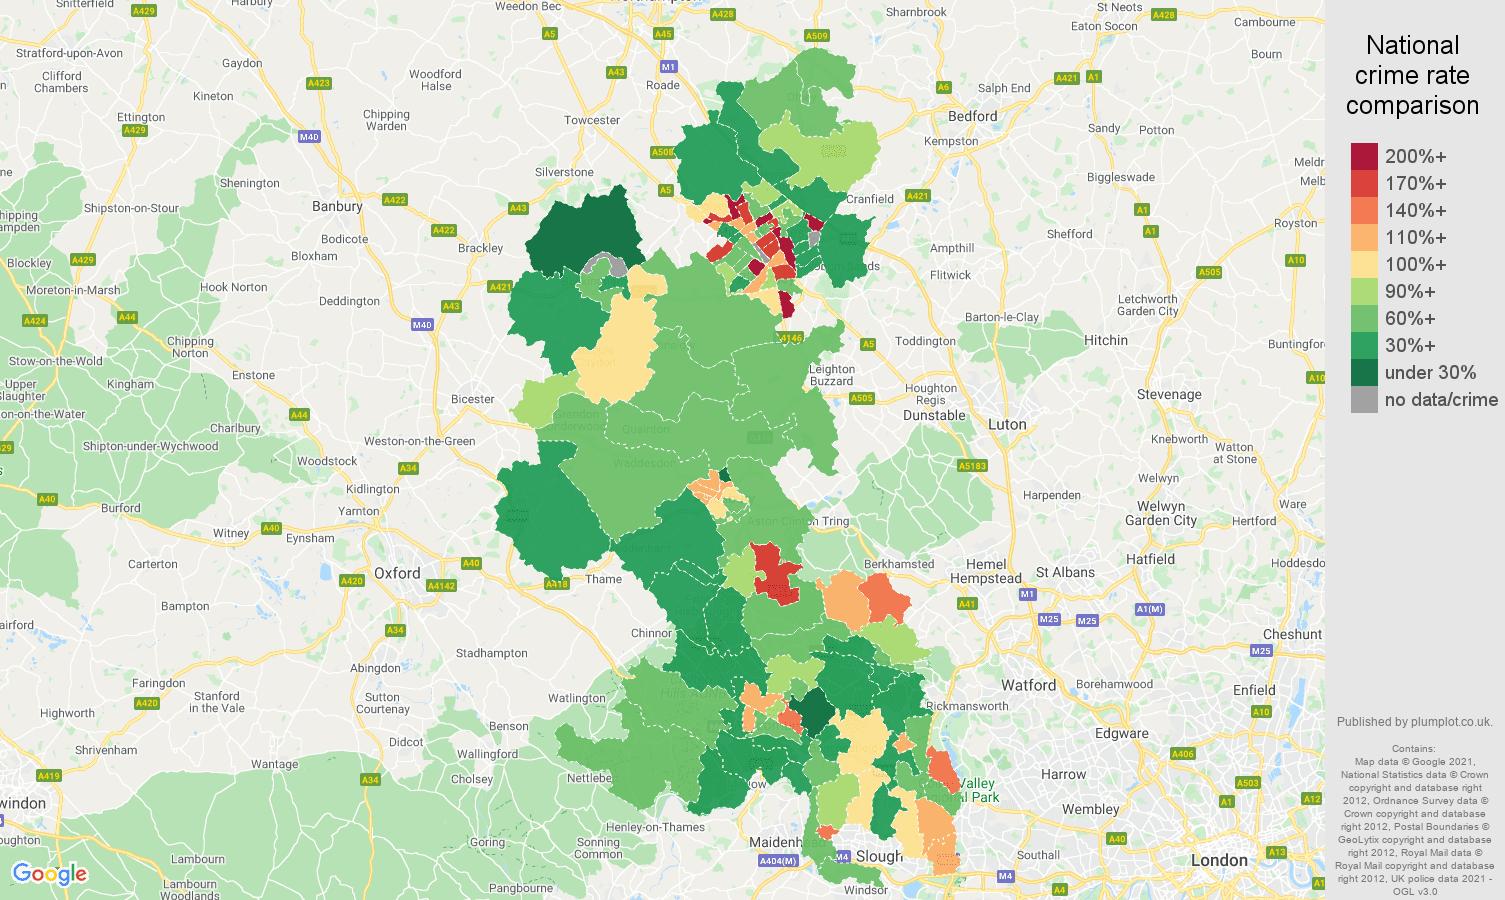 Buckinghamshire criminal damage and arson crime rate comparison map